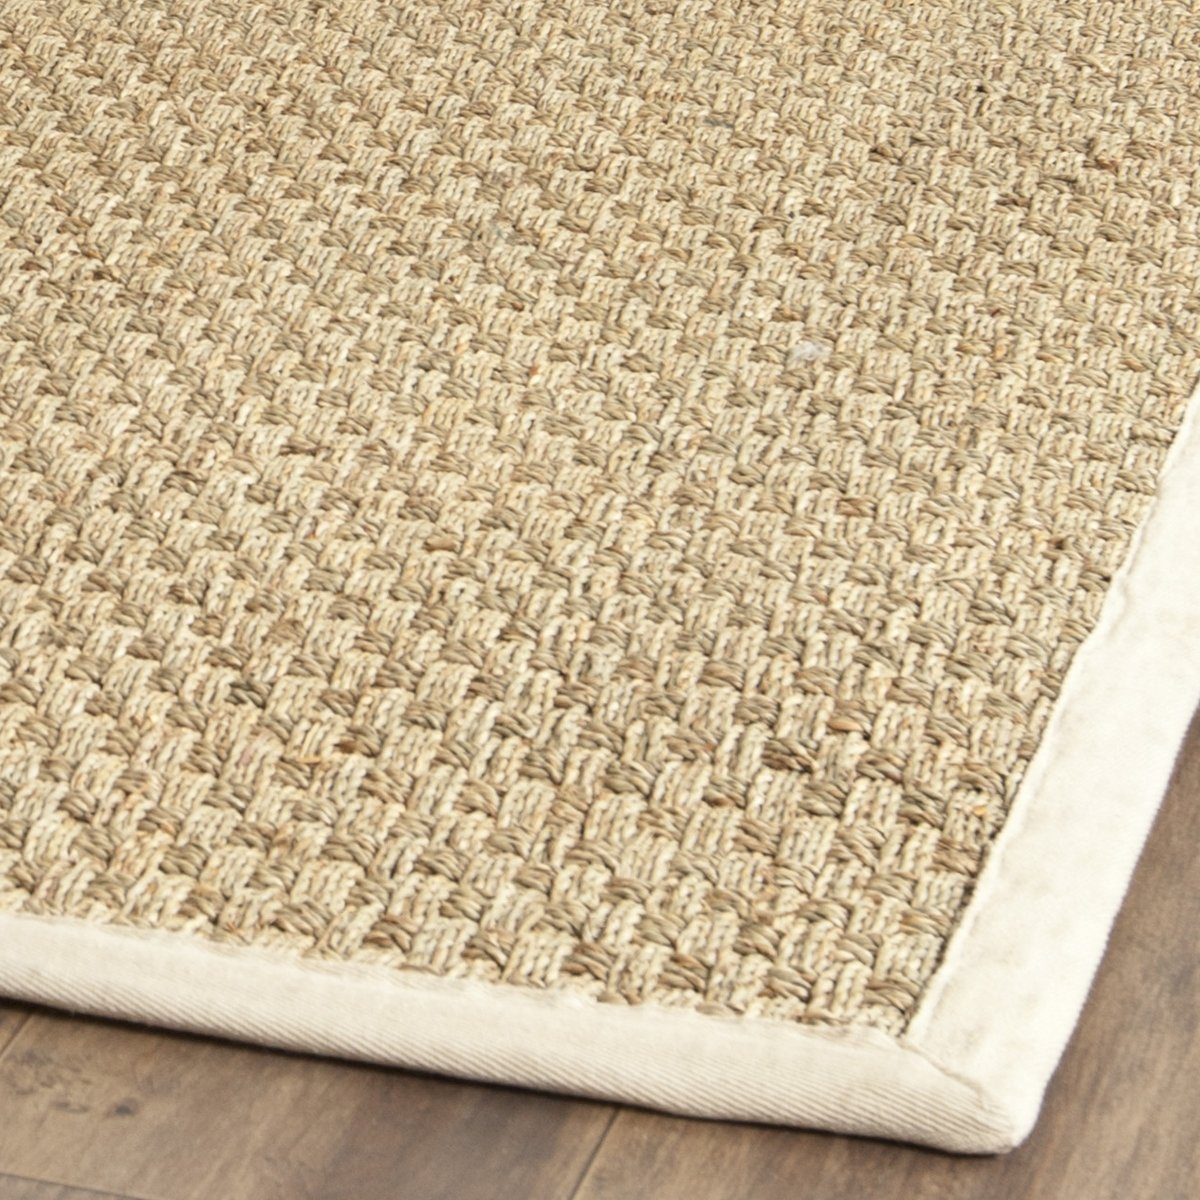 amazoncom safavieh natural fiber collection nf114j basketweave natural and ivory seagrass area rug 2u0027 x 3u0027 kitchen u0026 dining